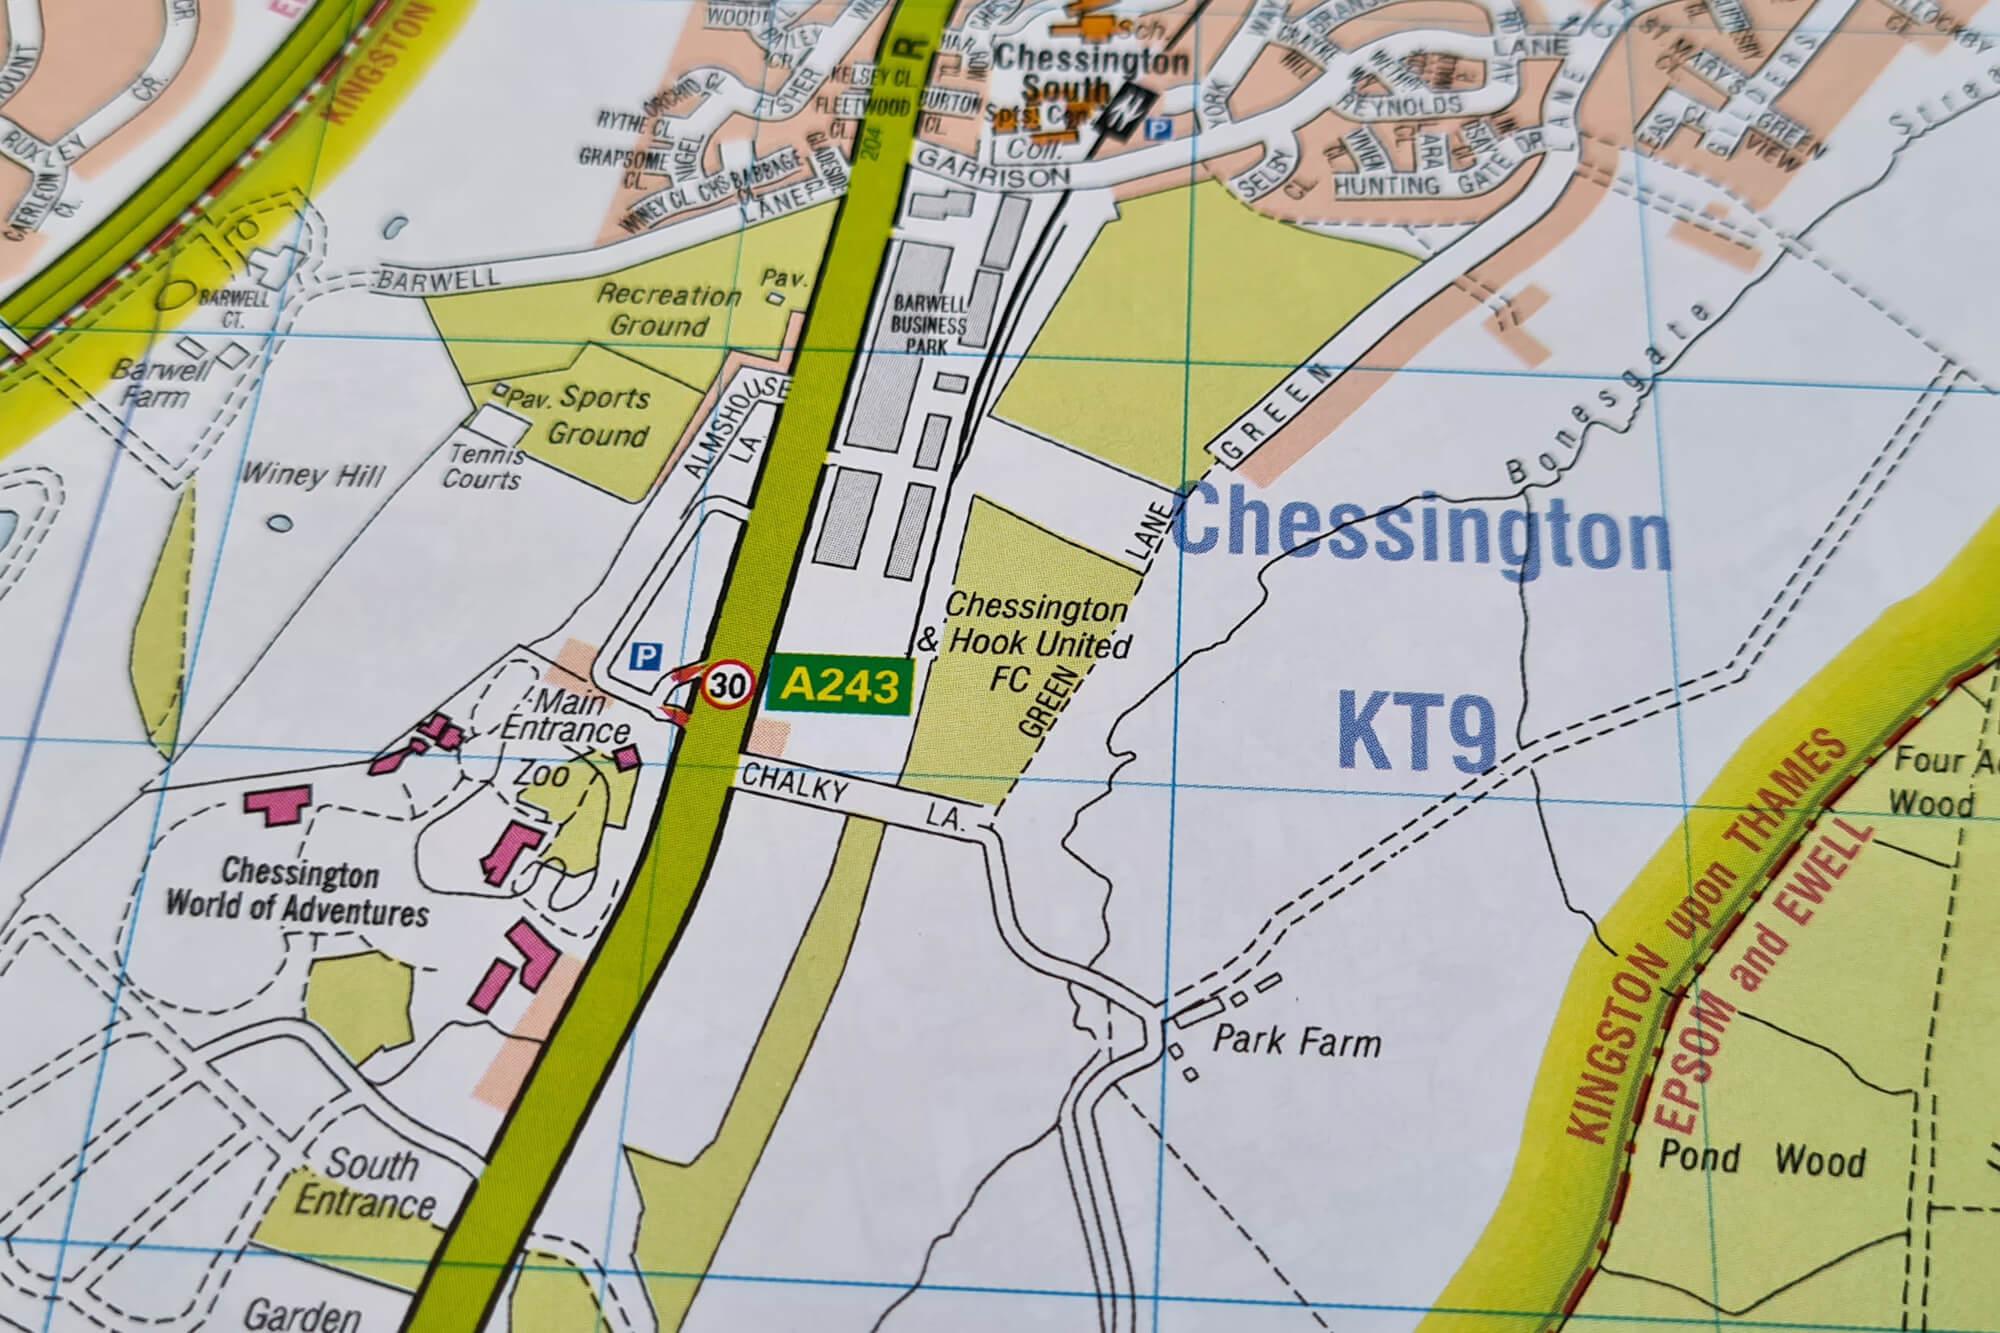 Chessington waste clearance